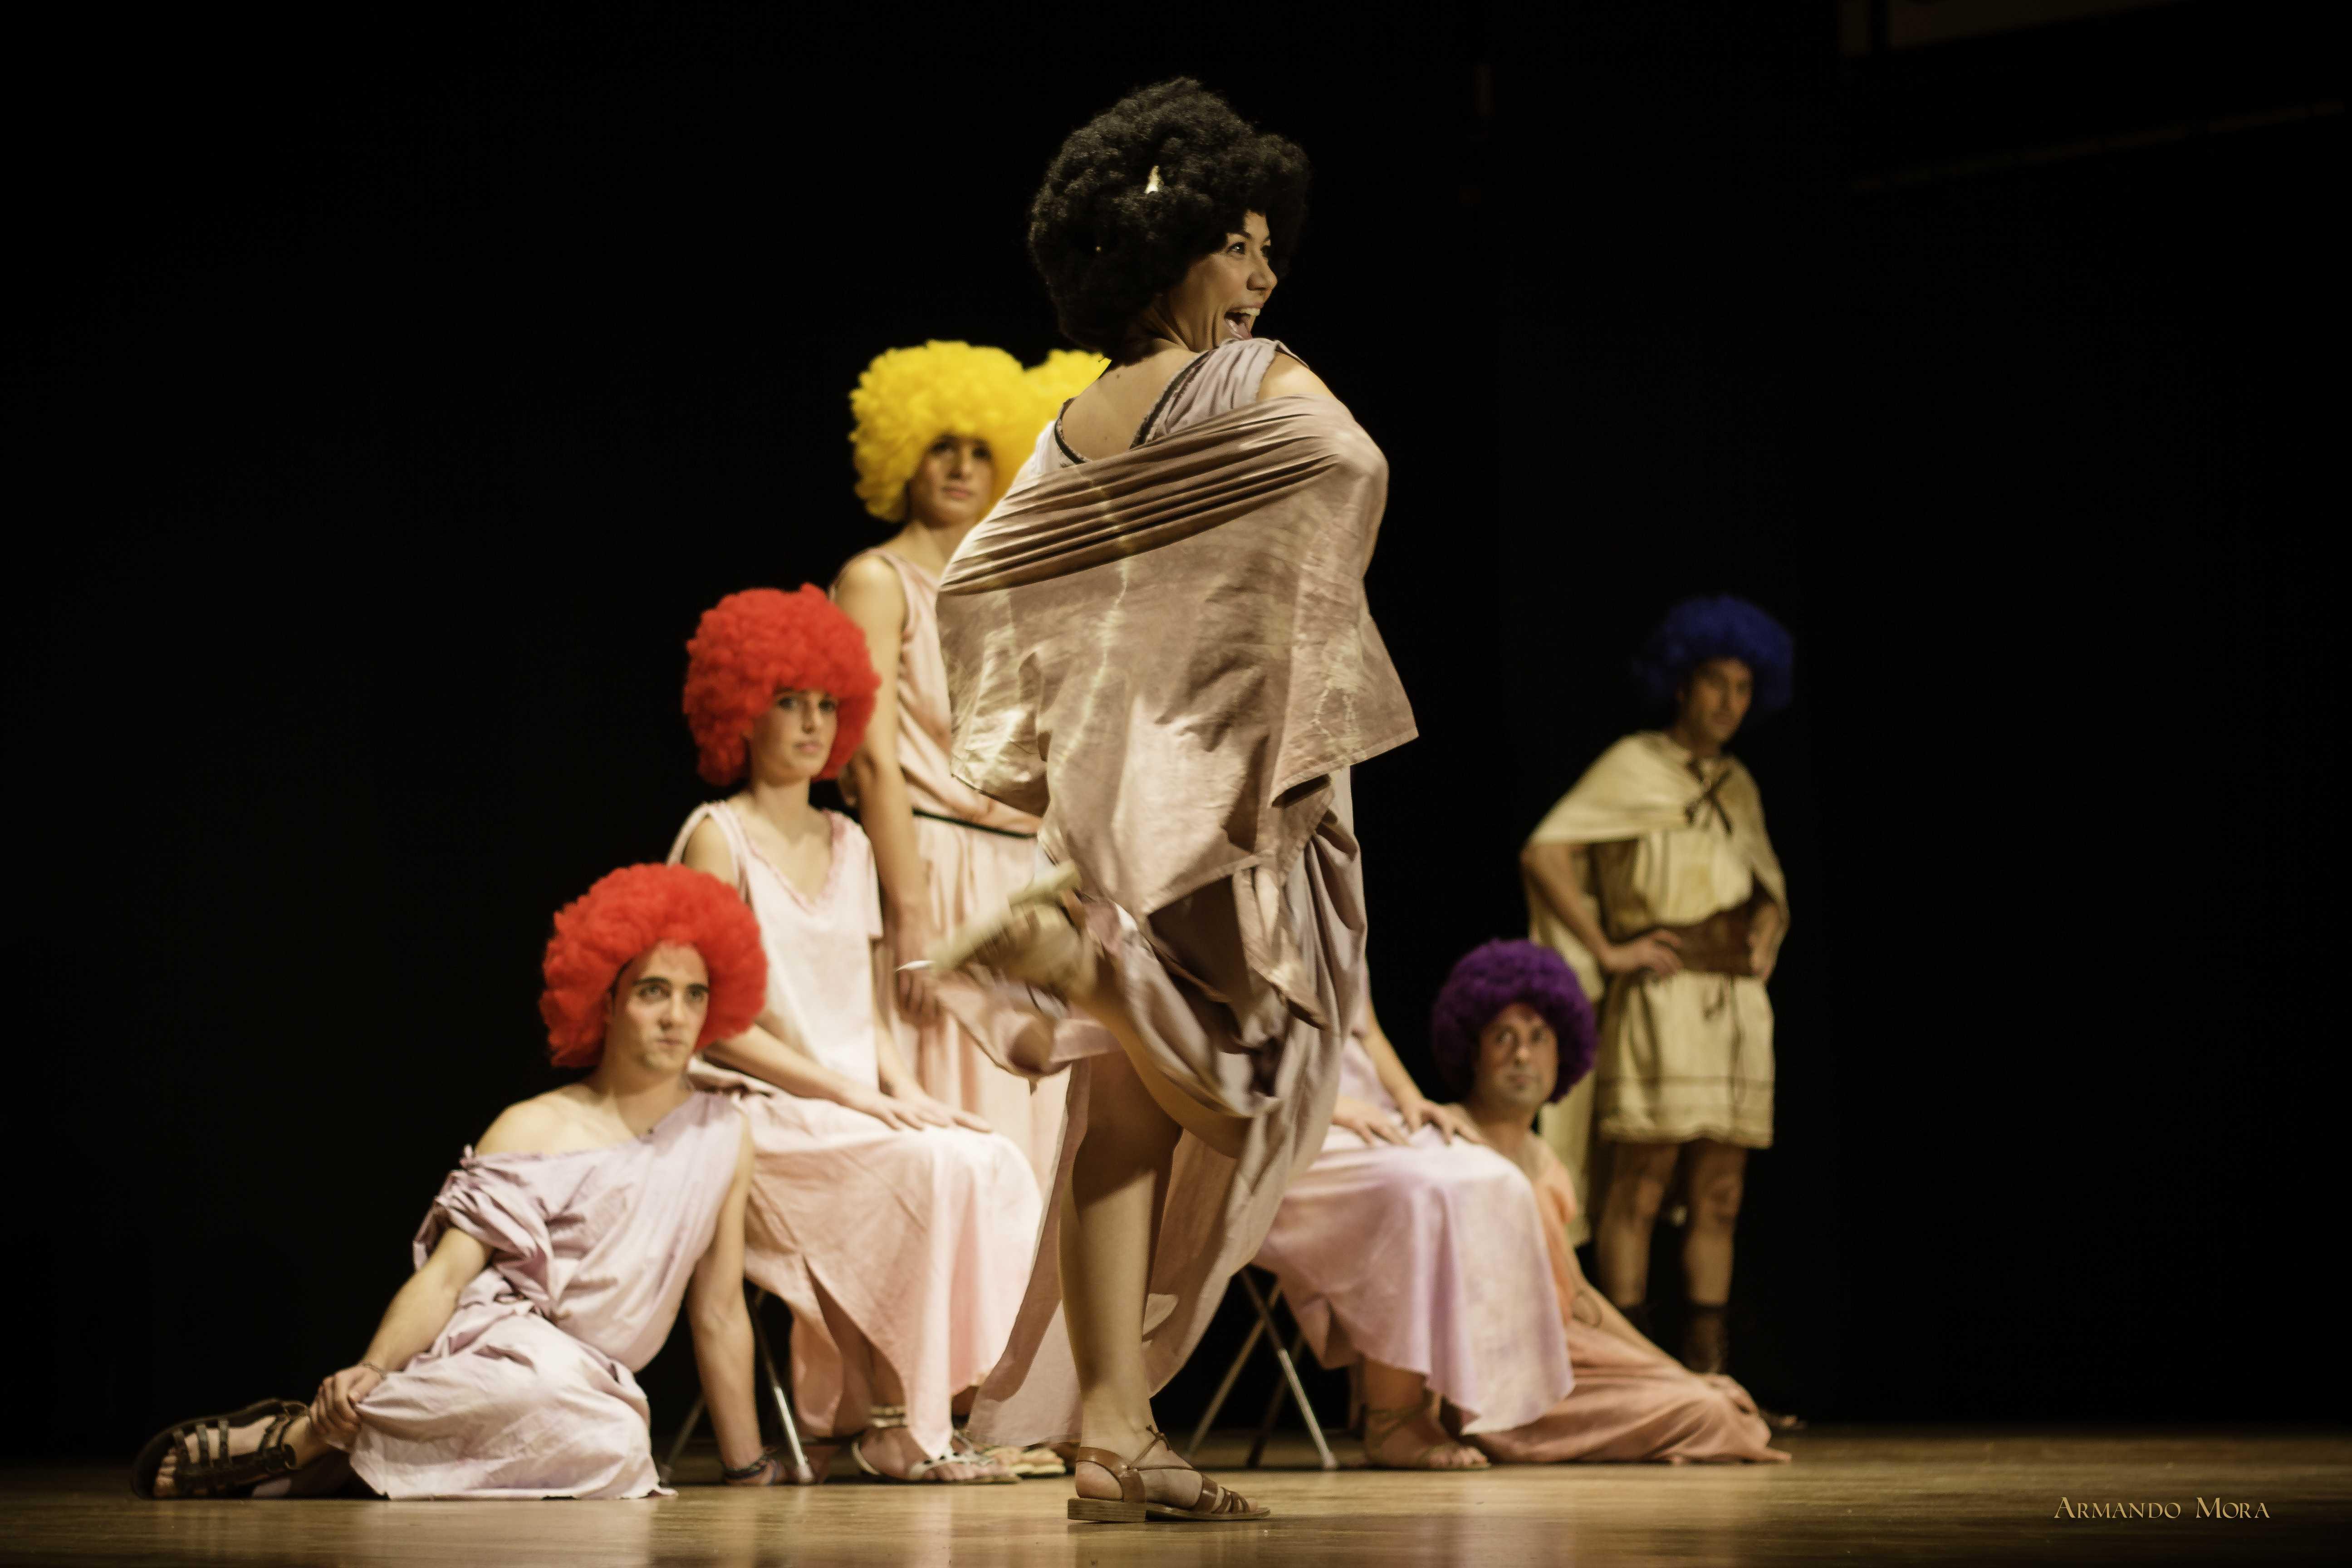 La Nucia Teatro Pelopidas previa 2014